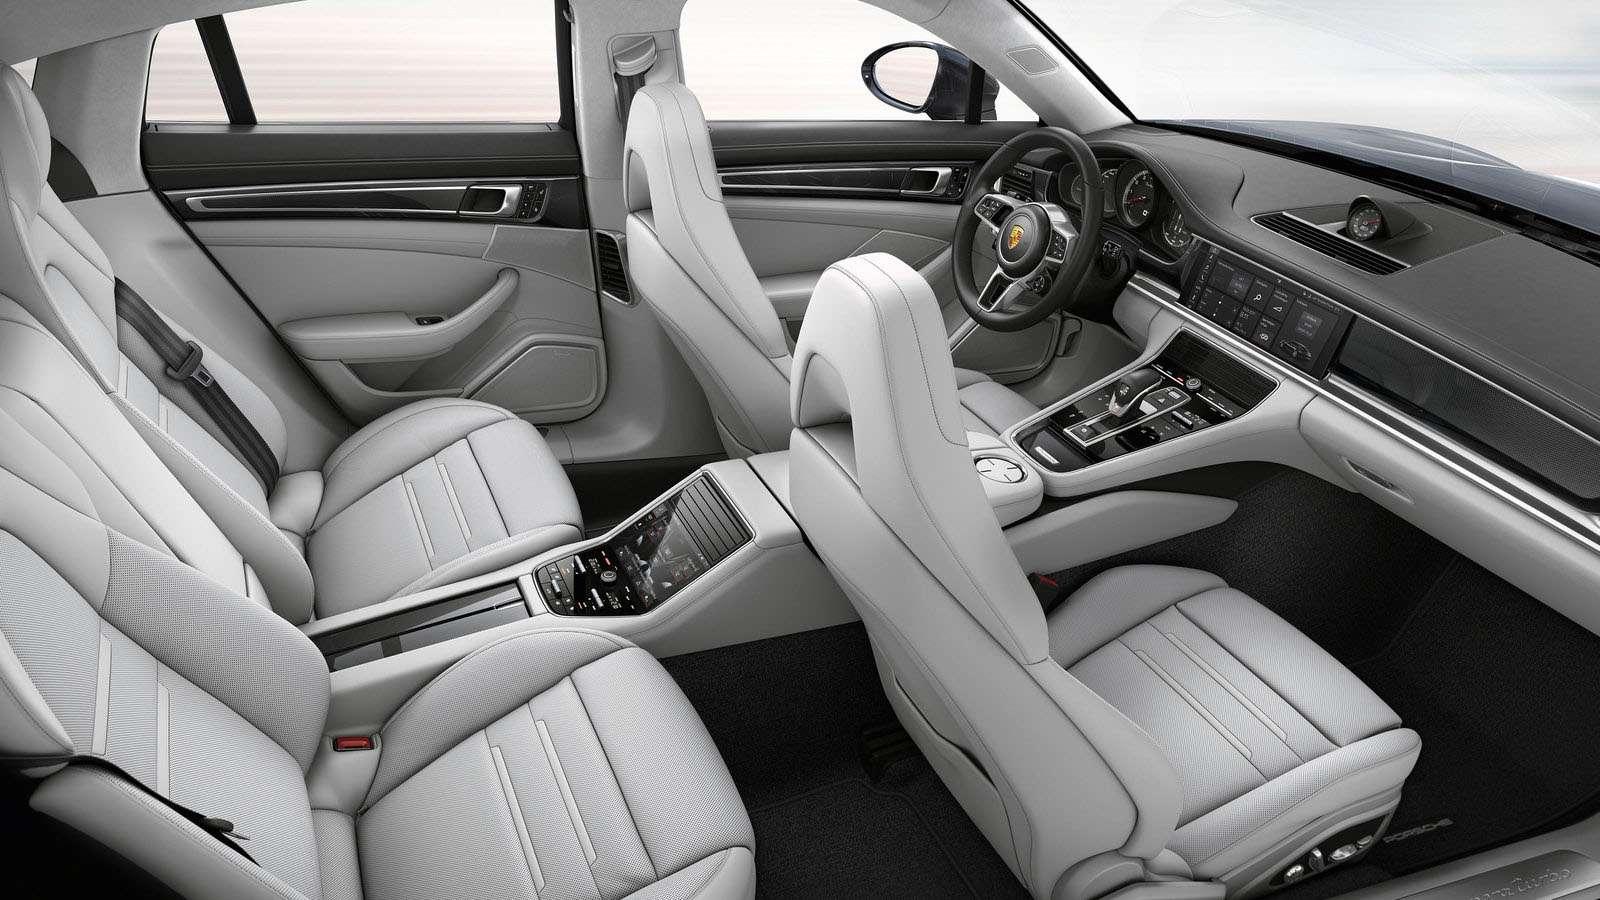 Porsche Panamera Interior Features